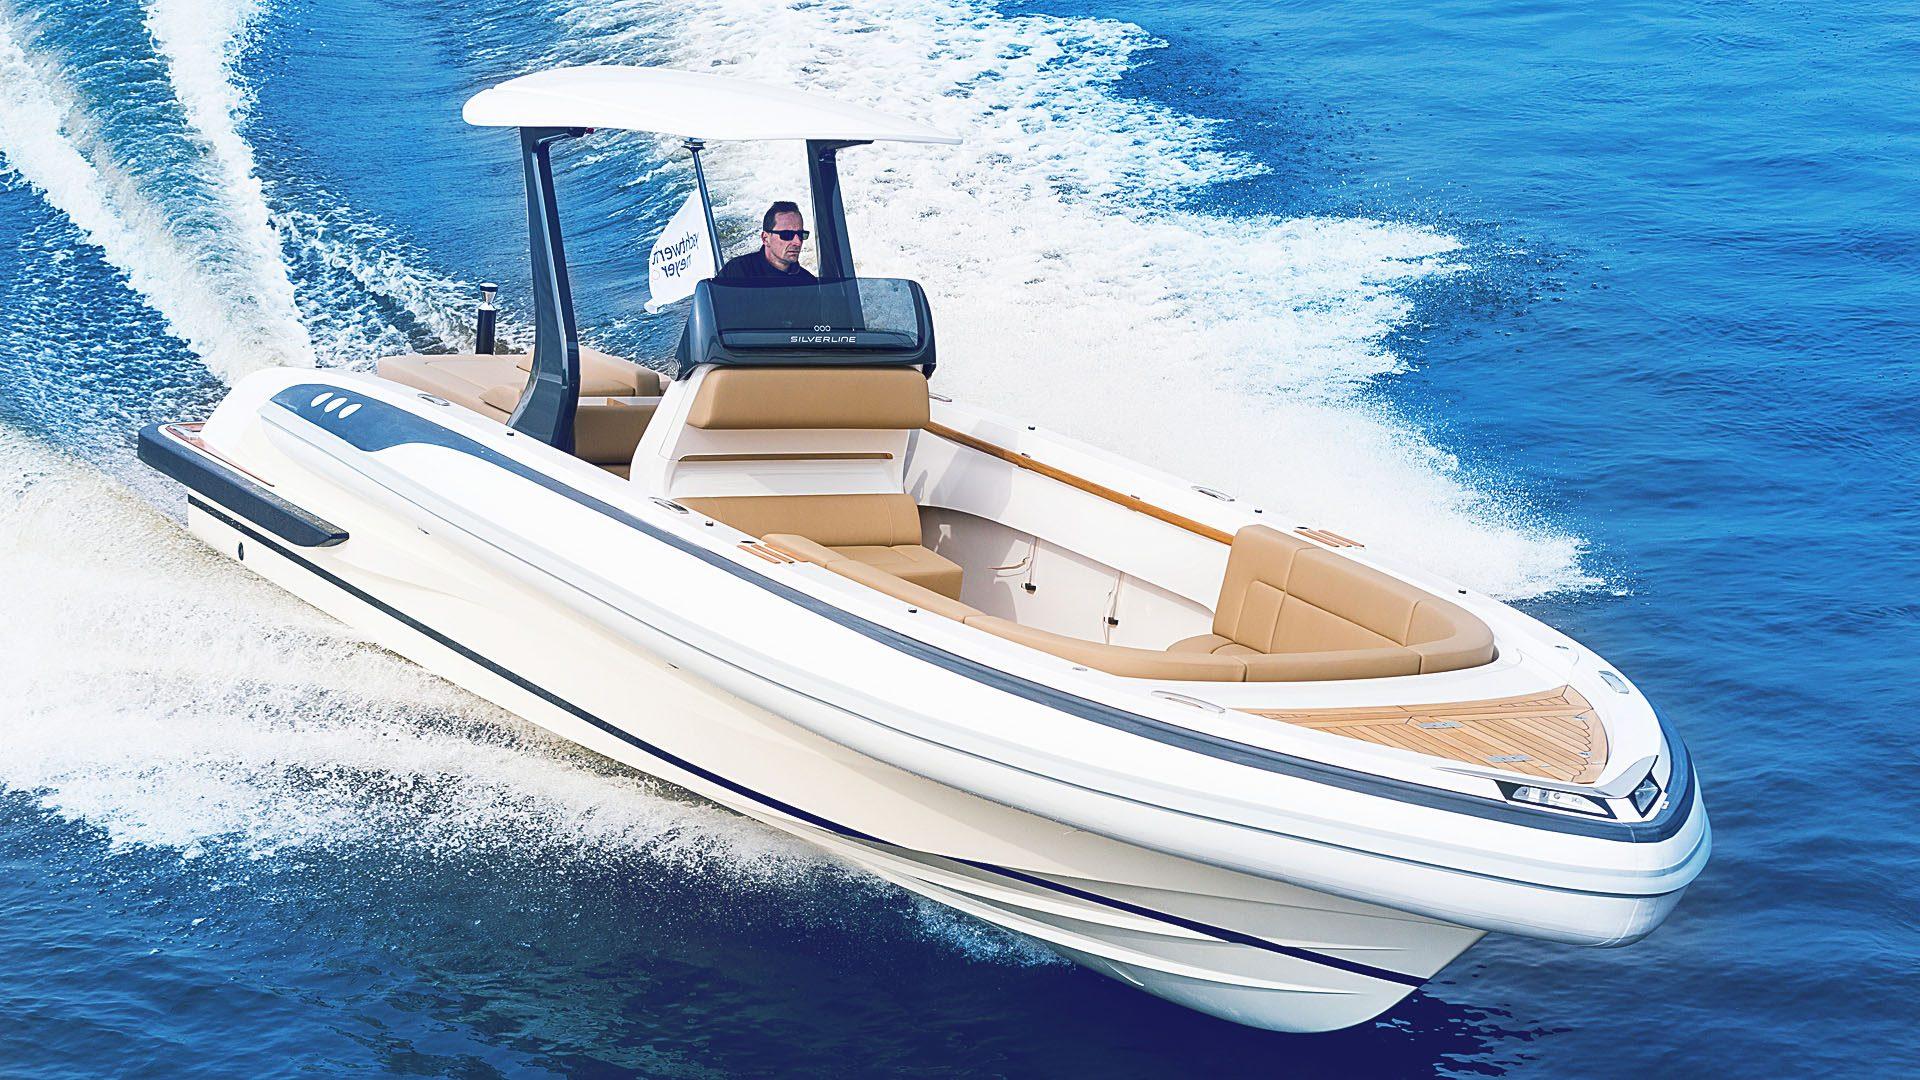 Rib boat tender yacht design by Hamid Bekradi